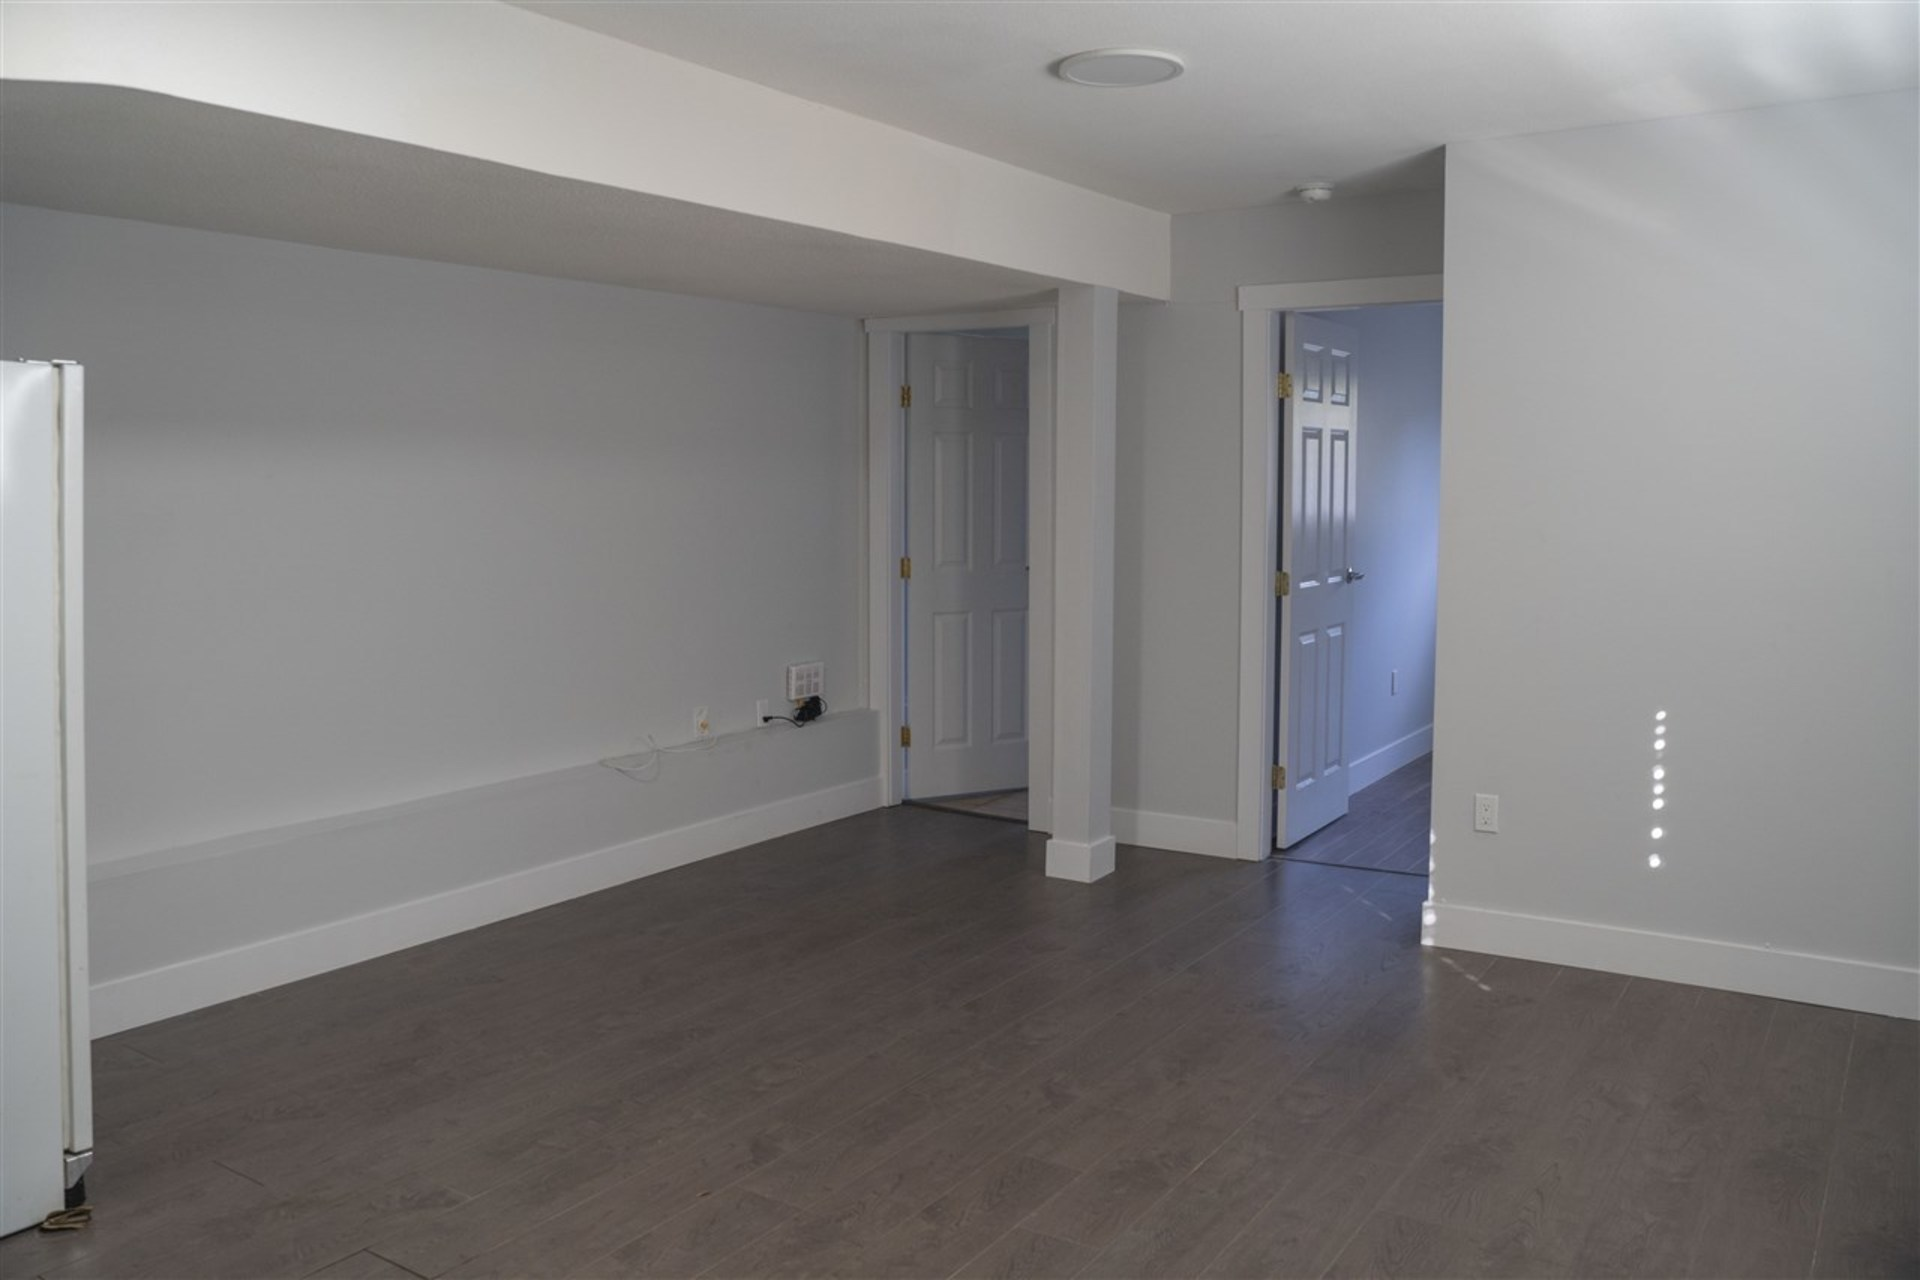 5770-185-street-cloverdale-bc-cloverdale-16 at 5770 185 Street, Cloverdale BC, Cloverdale